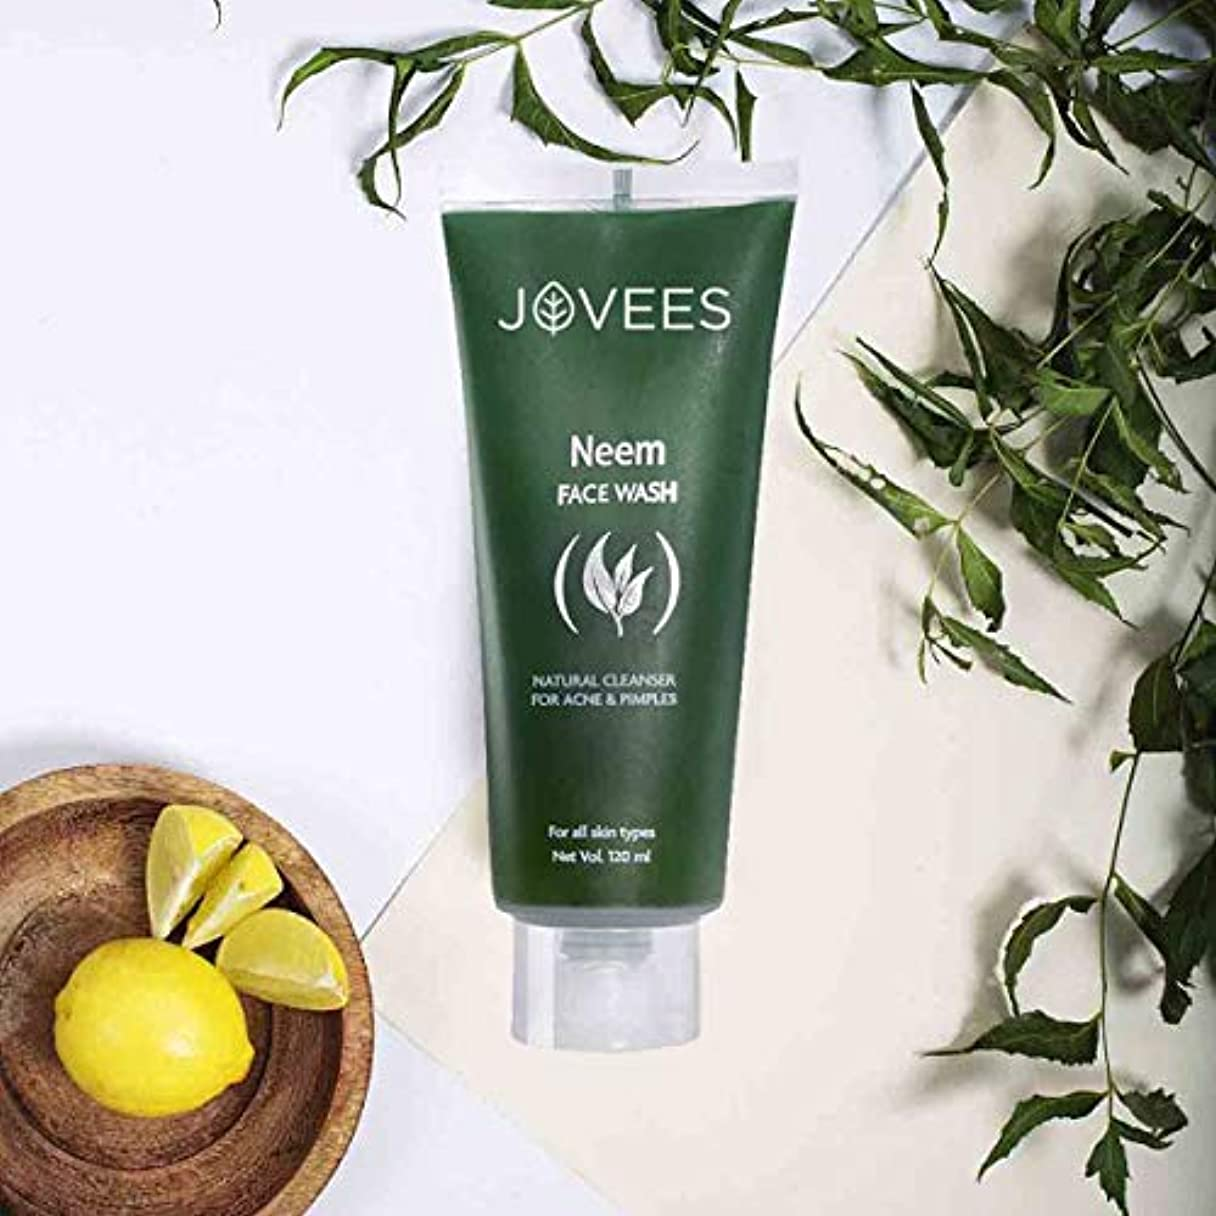 Jovees Natural Neem Face Wash 120ml help mitigate pimple & Acne improve skin complexion ナチュラルニームフェイスウォッシュがニキビの...